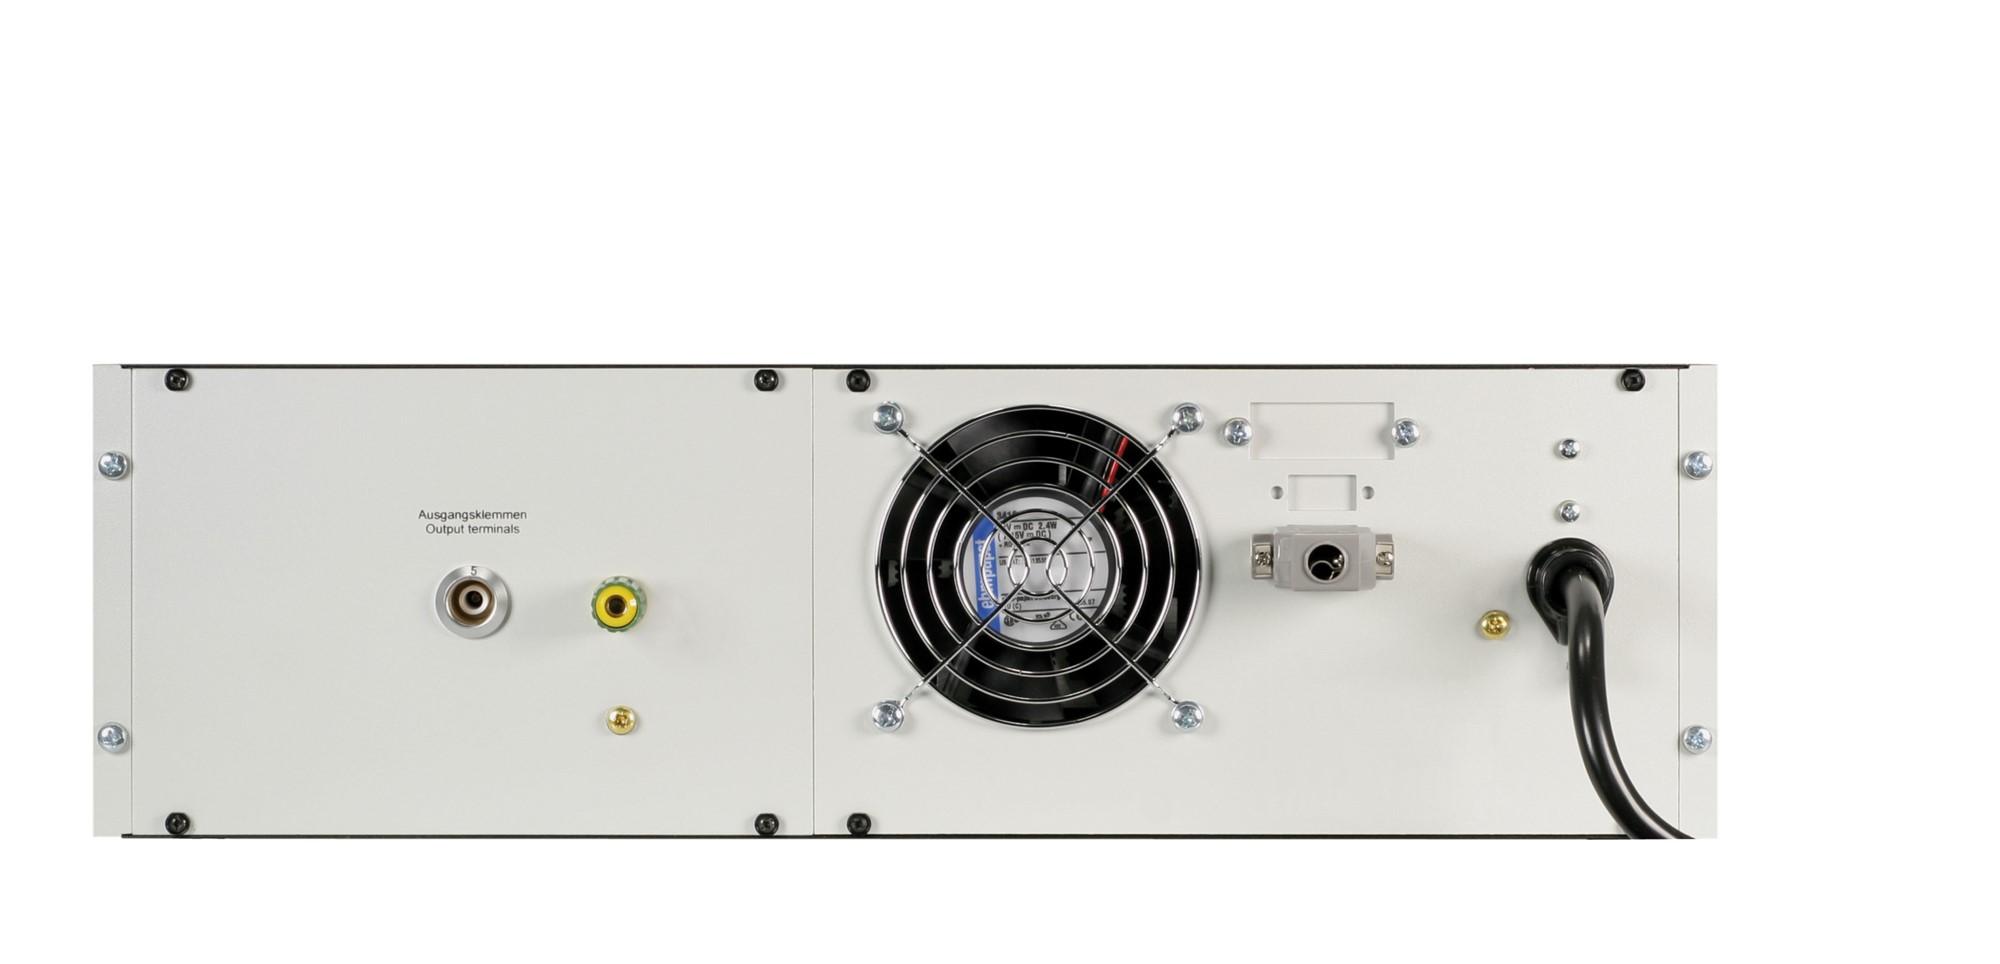 Eps Hv 9000 6k 2000 R High Voltage Power Supply